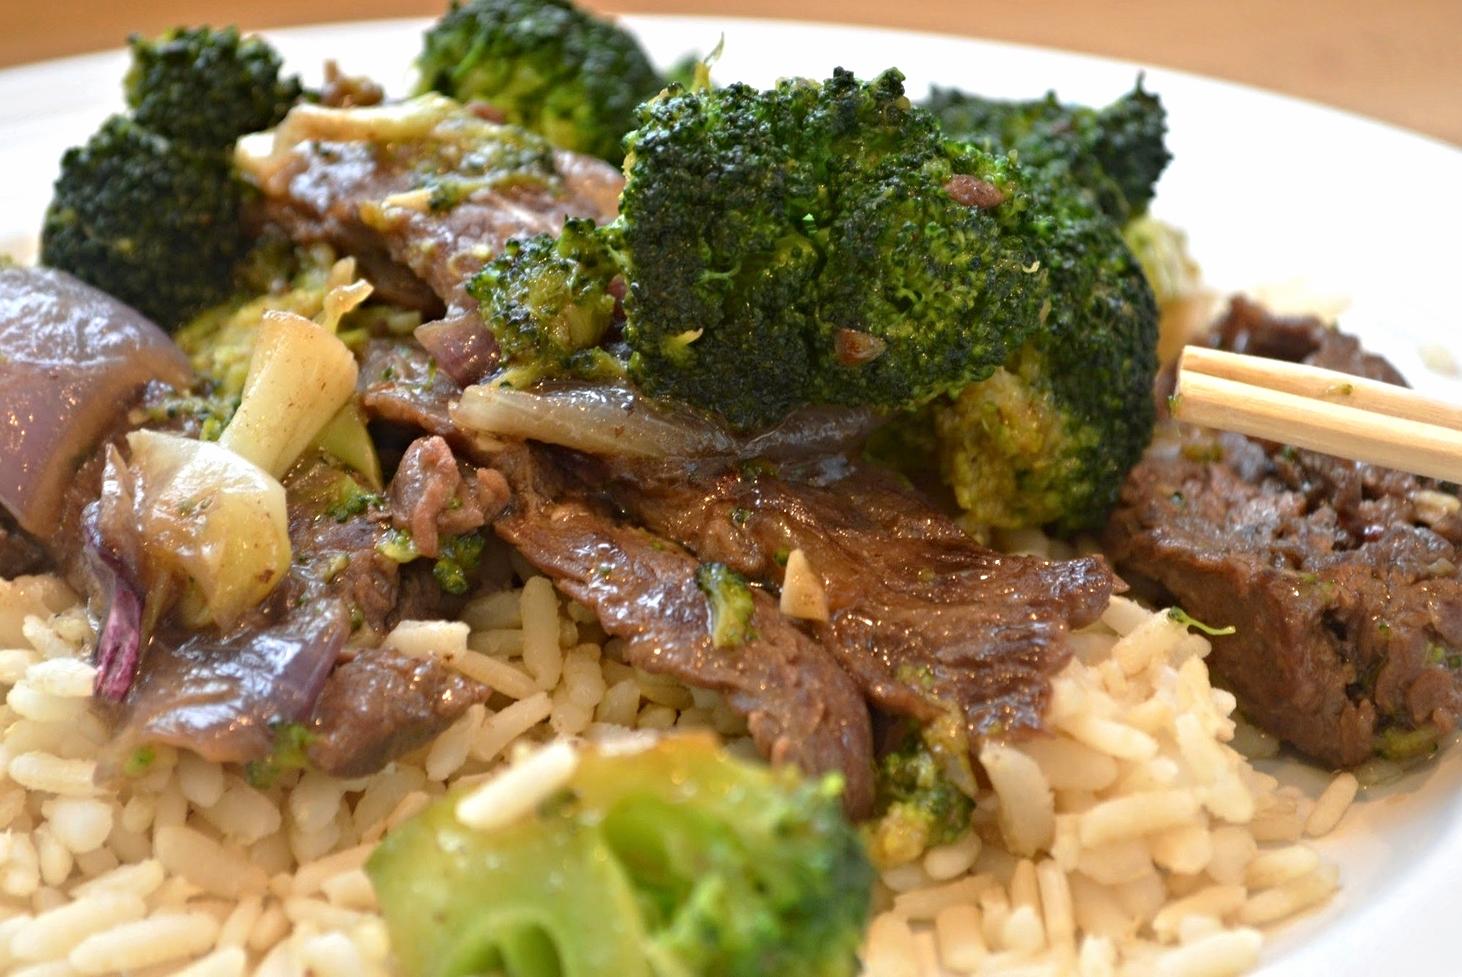 Beef with Broccoli and Garlic Sauce Stir Fry